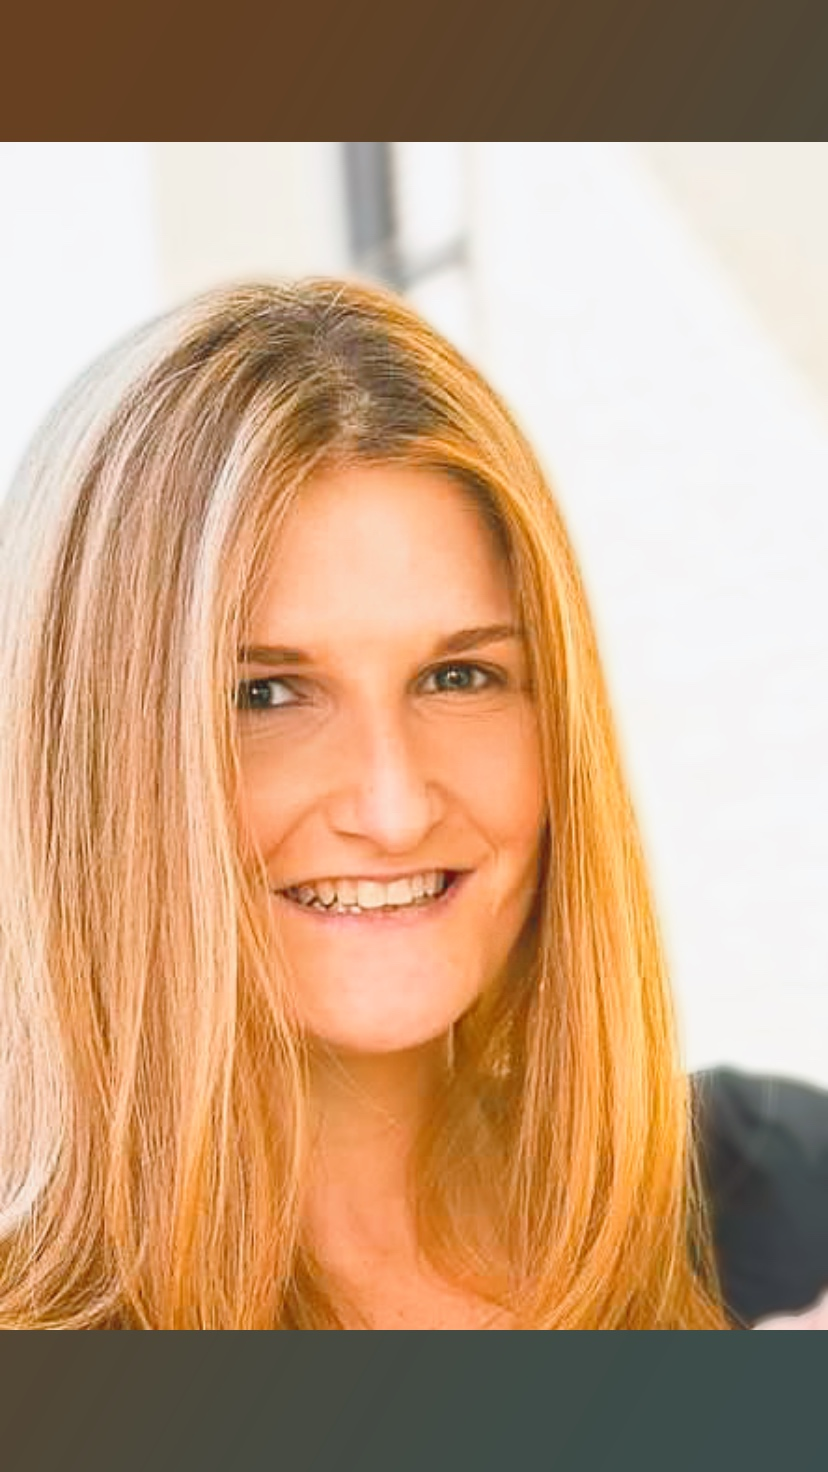 Meghan Ahrens